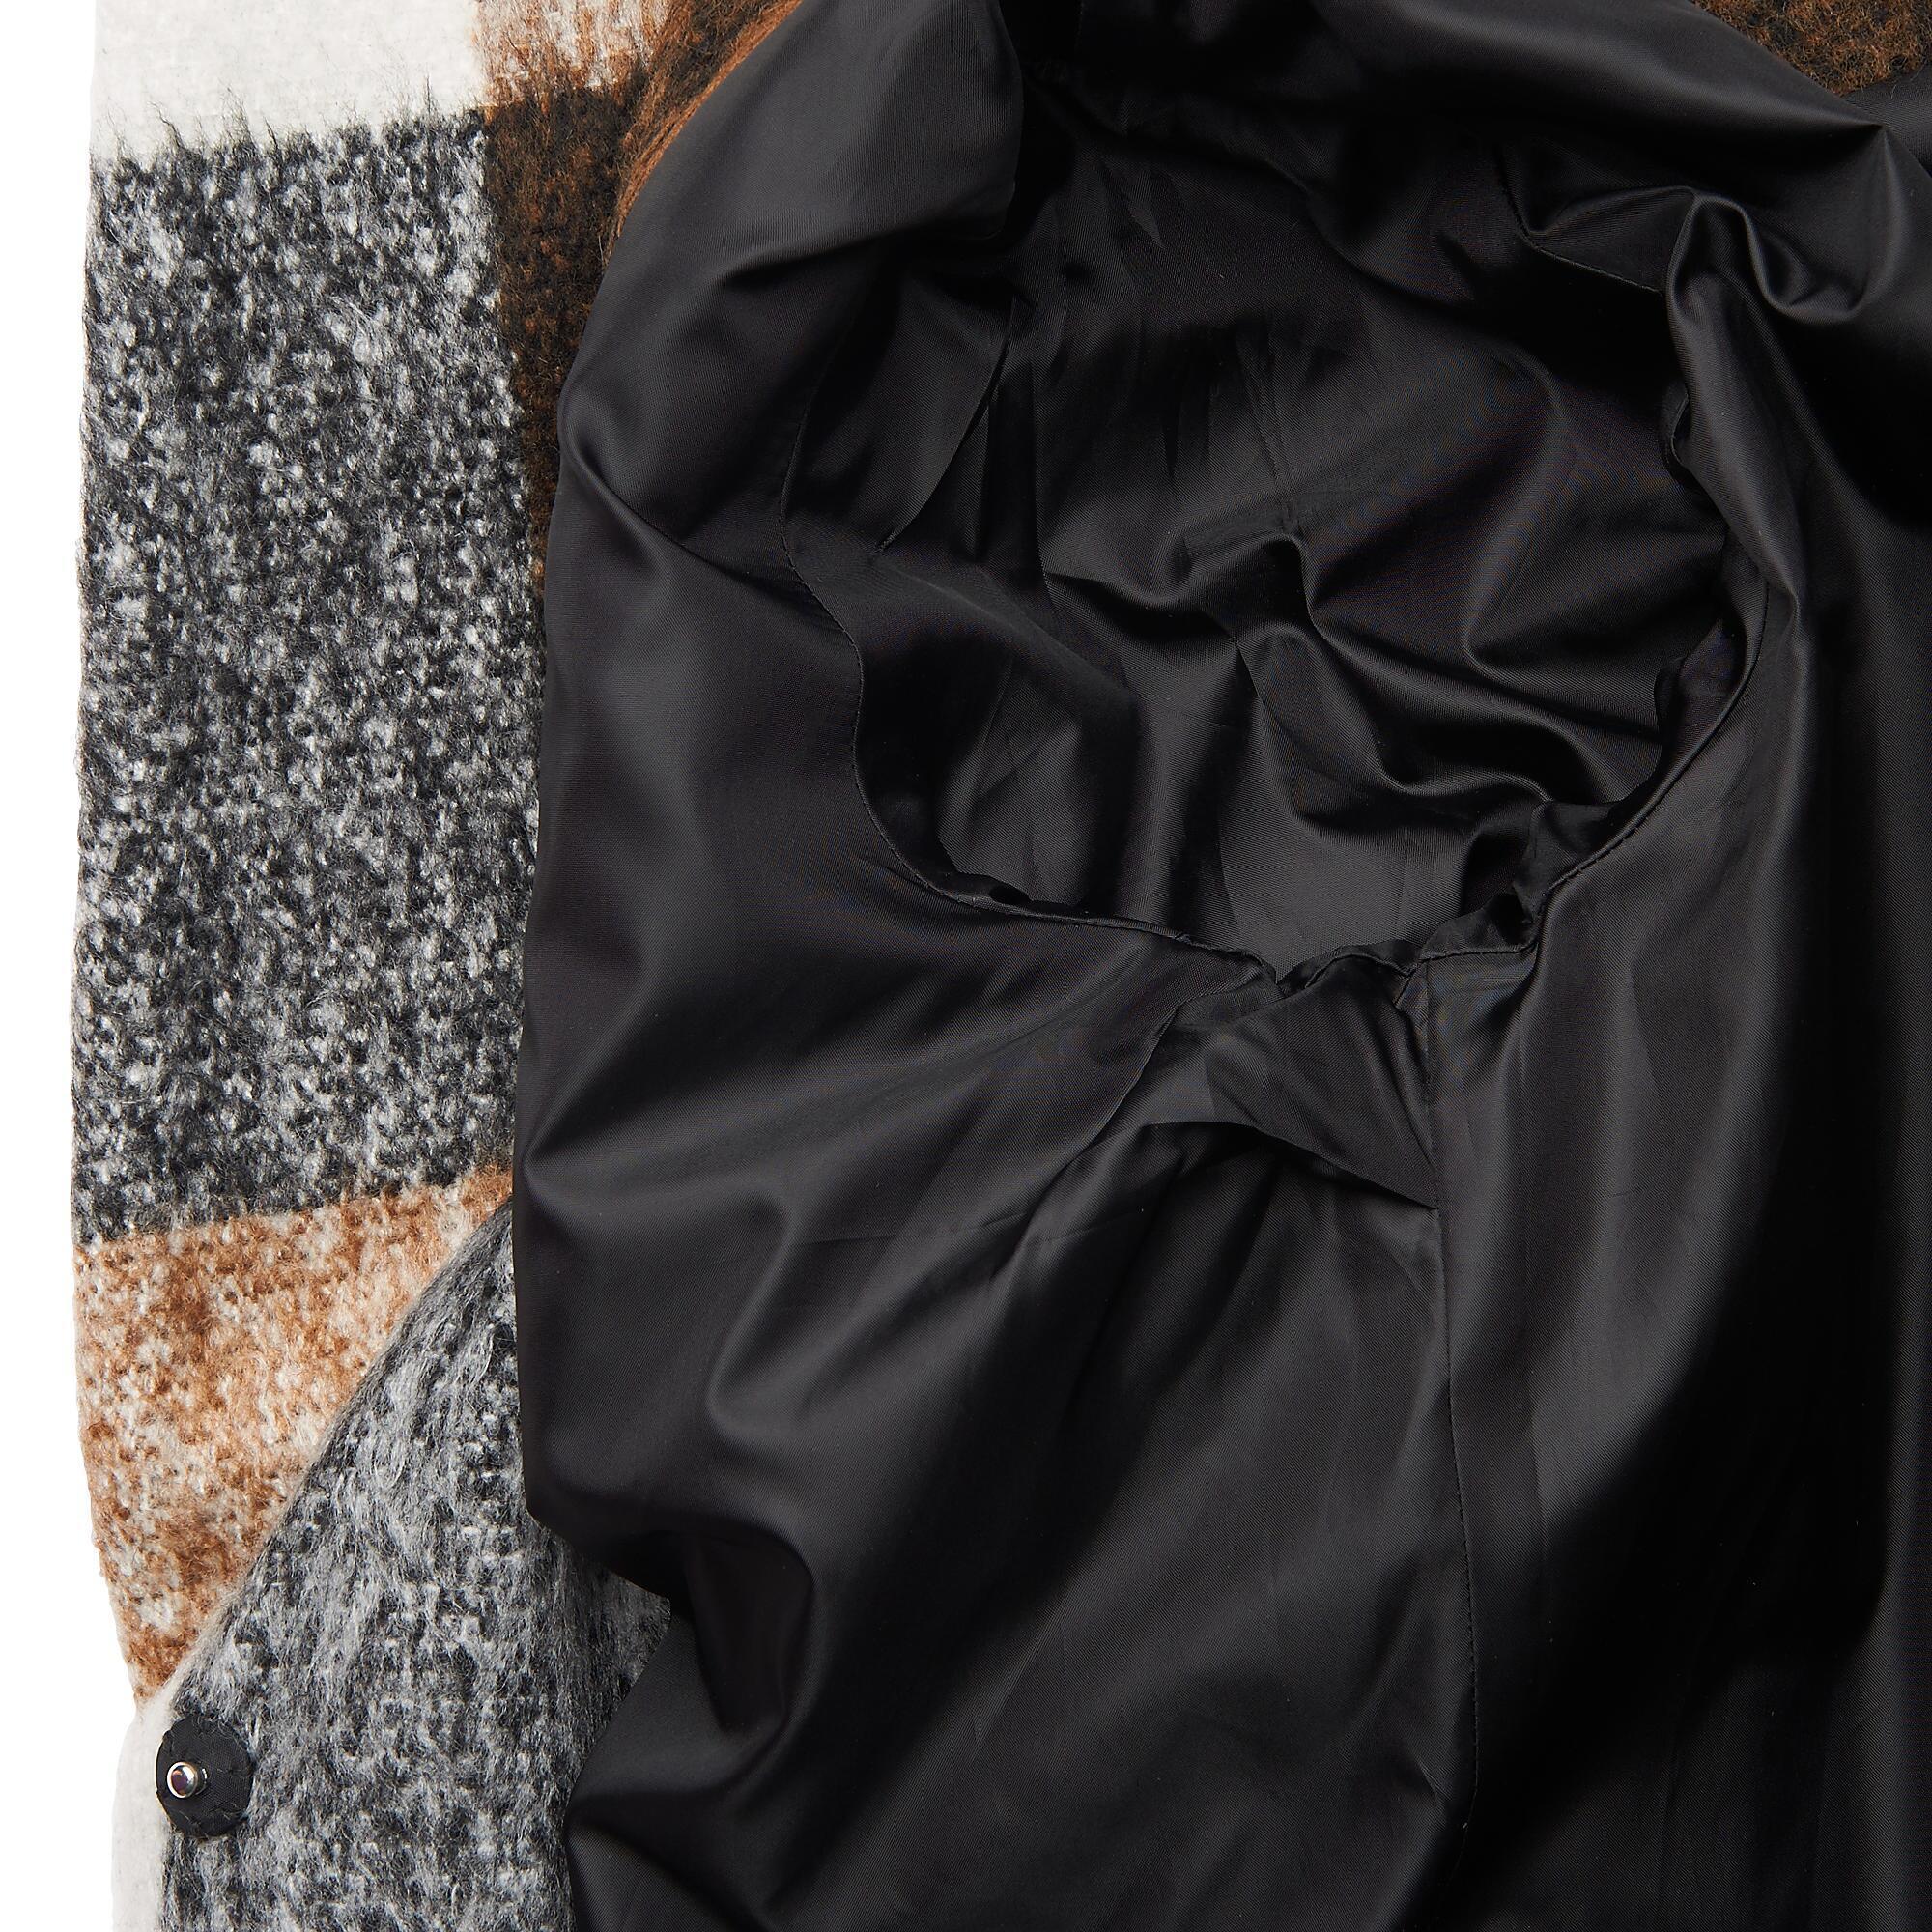 Black rivet plaid coat